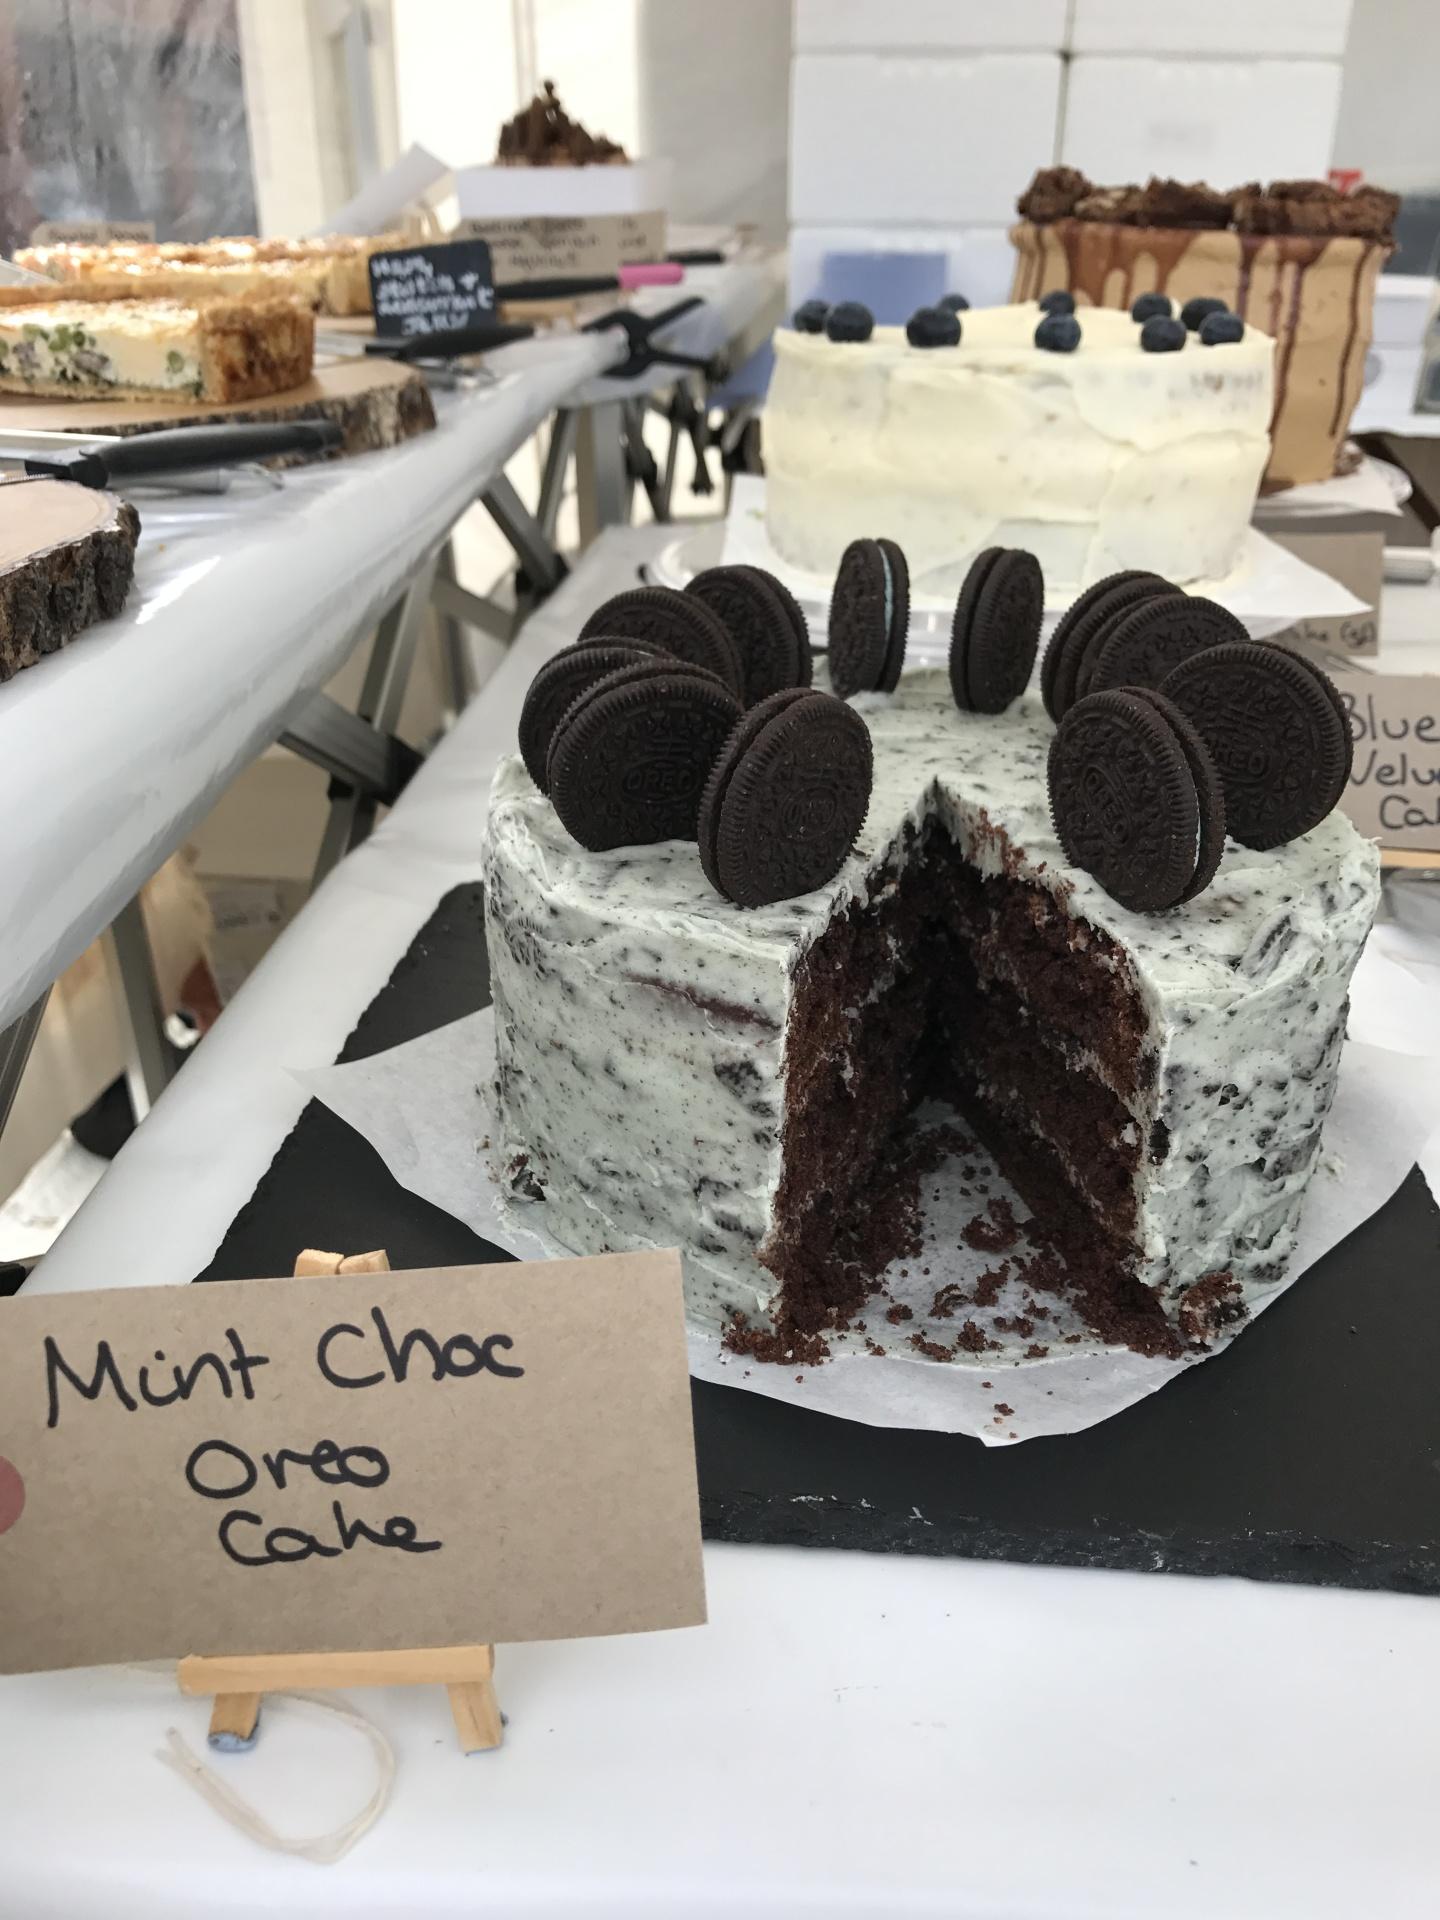 Mint Oreo Cake